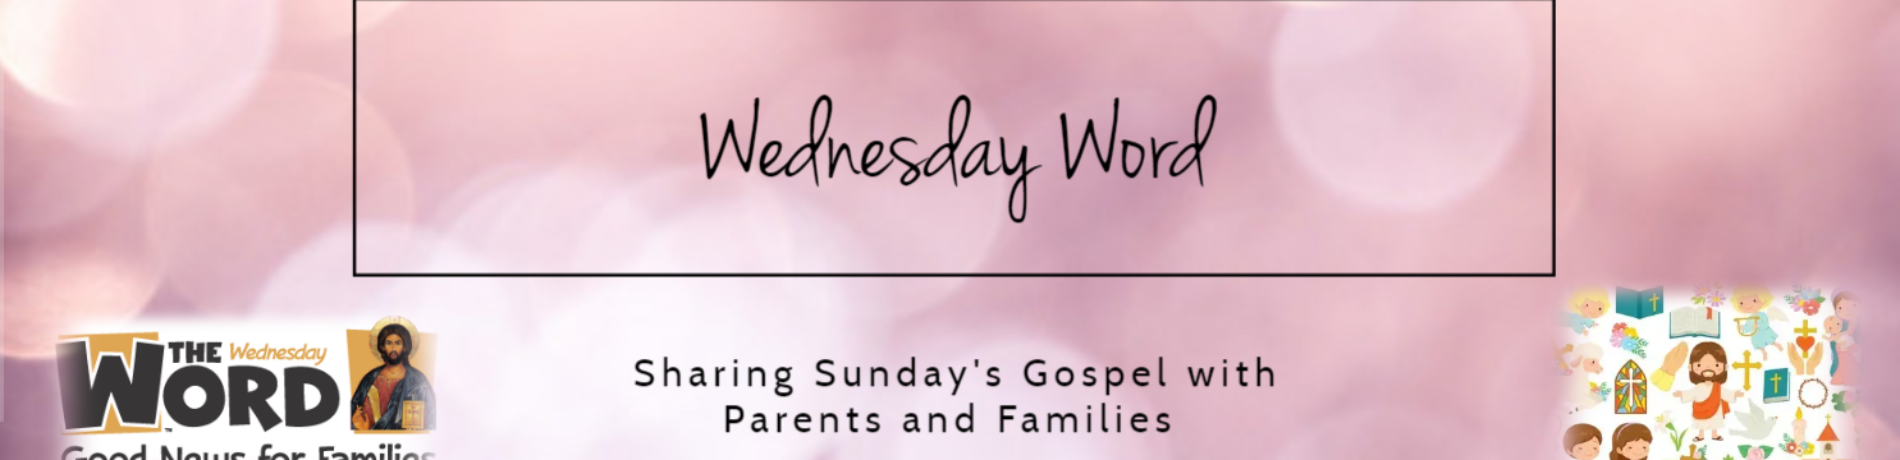 Wednesday Word